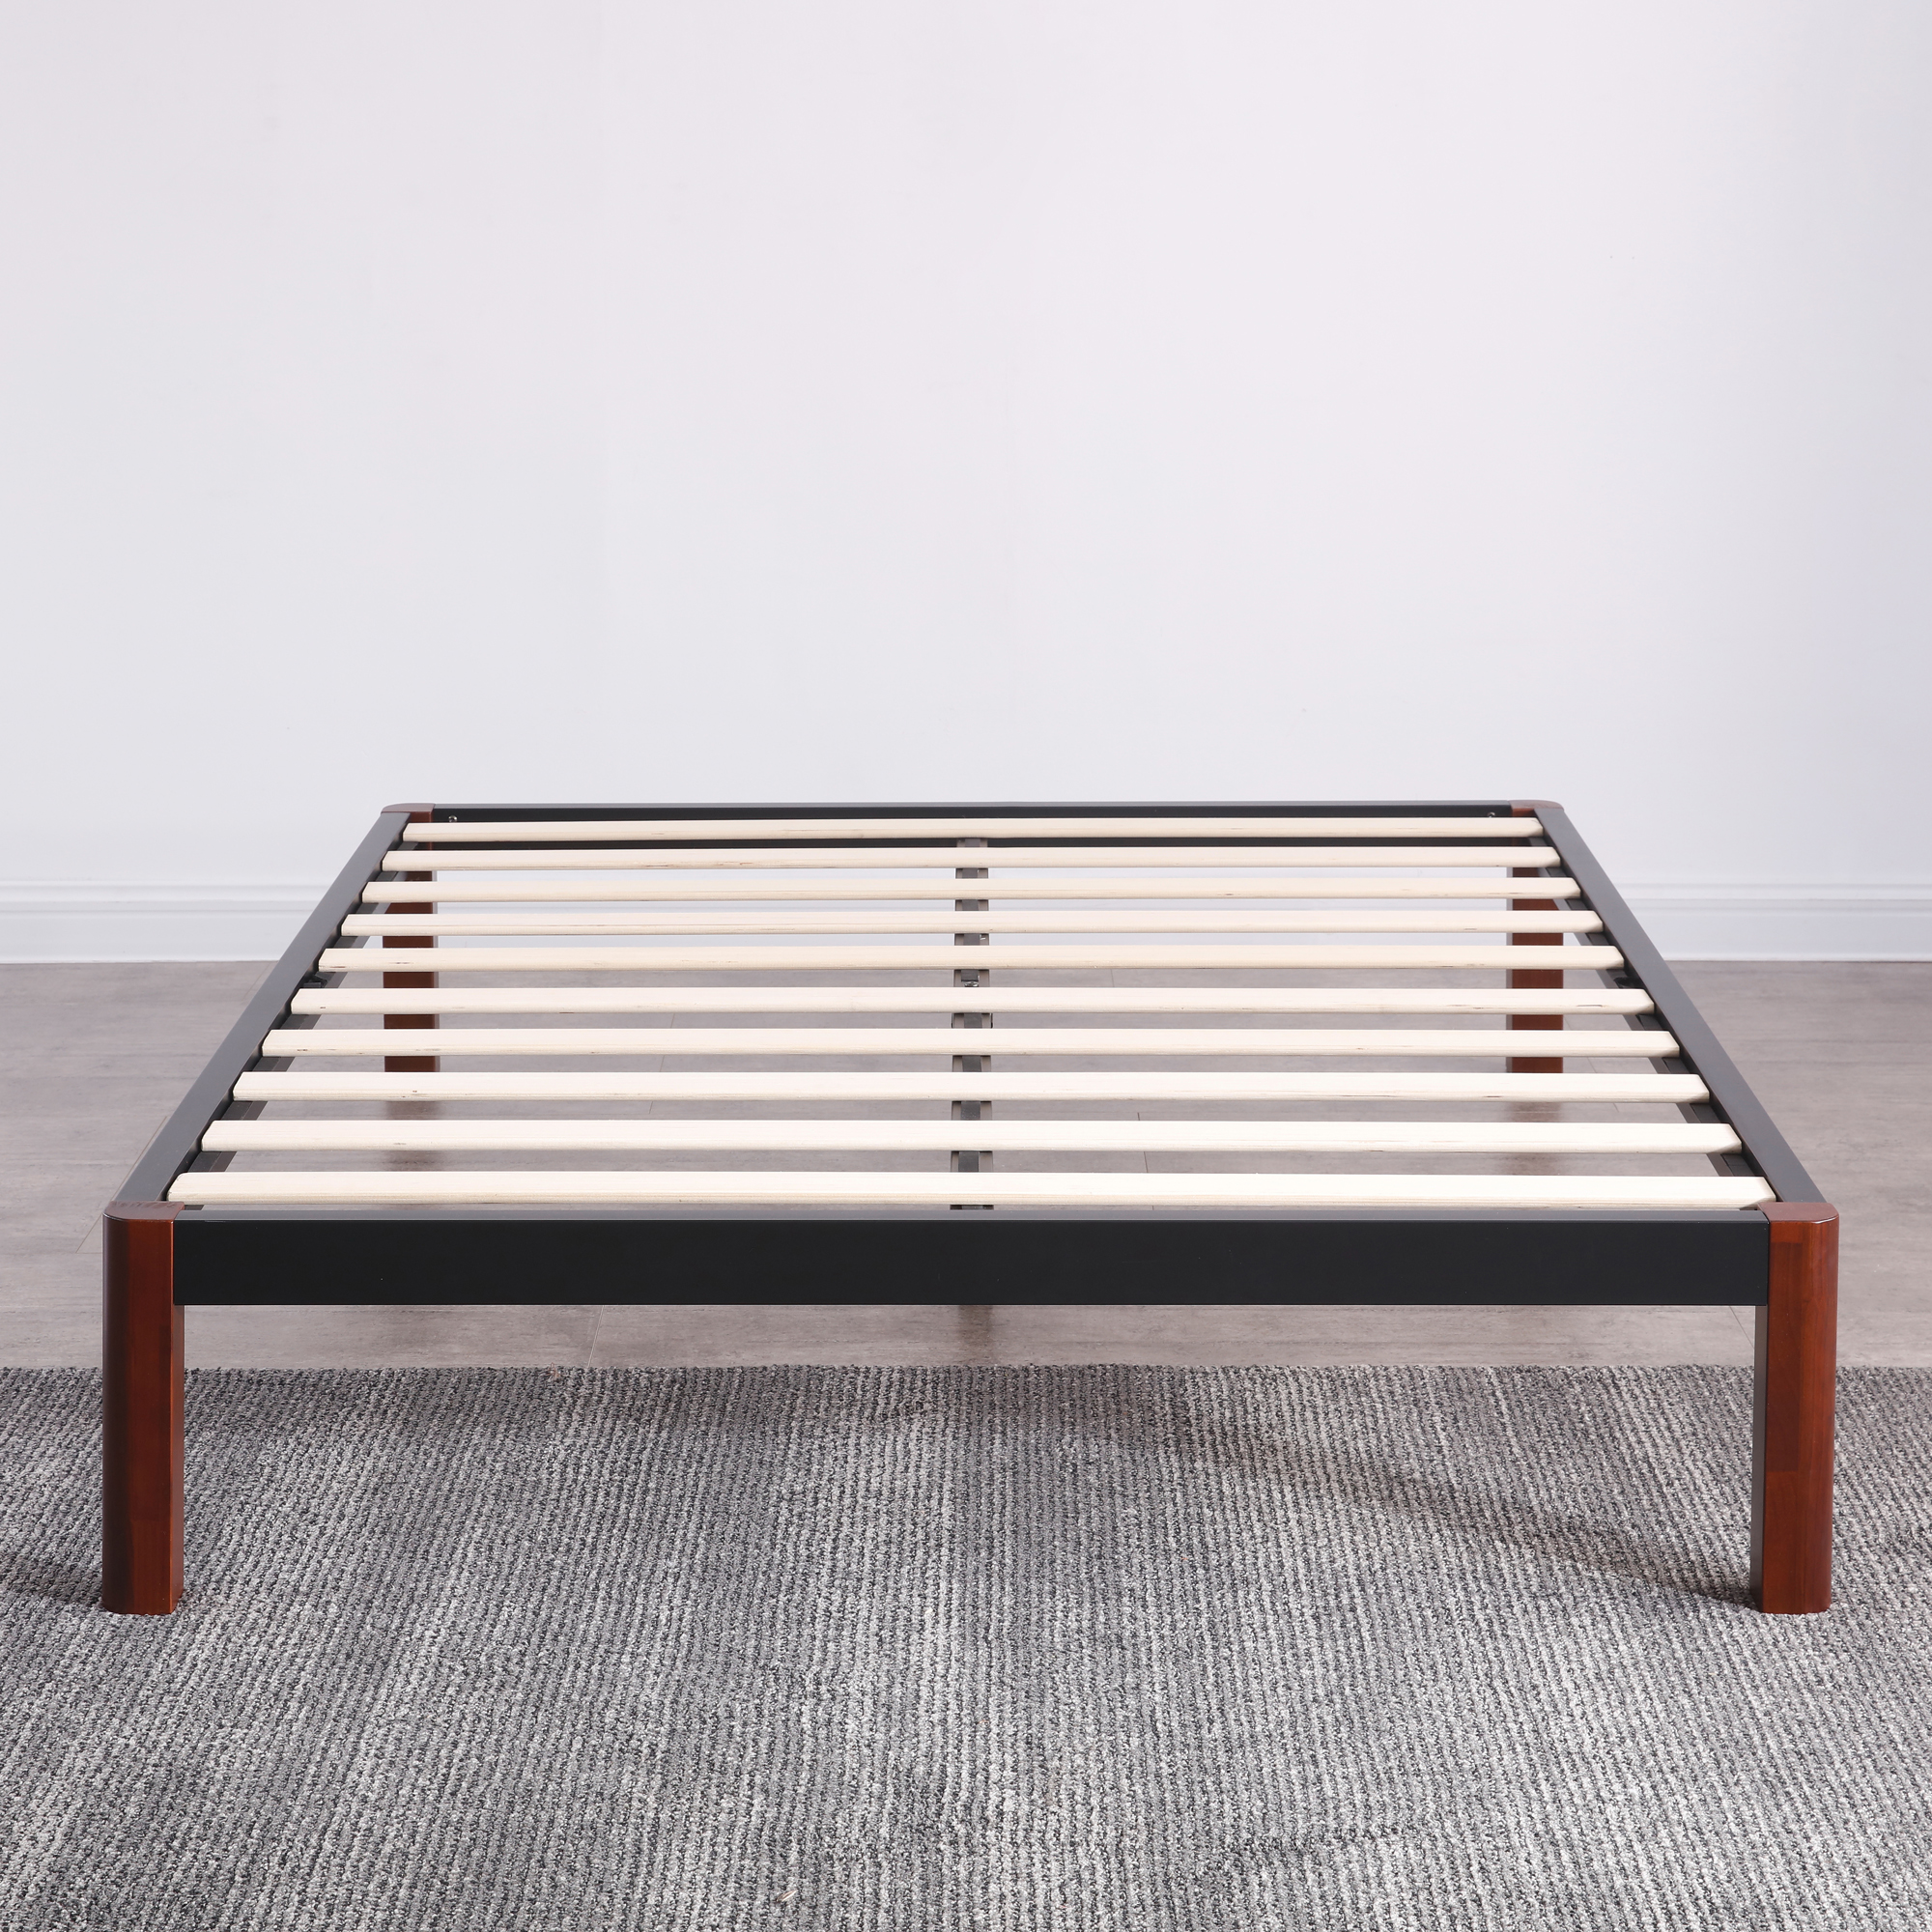 Modern Sleep Devon Wood Slat and Metal Platform Bed Frame | Mattress Foundation, Multiple Sizes